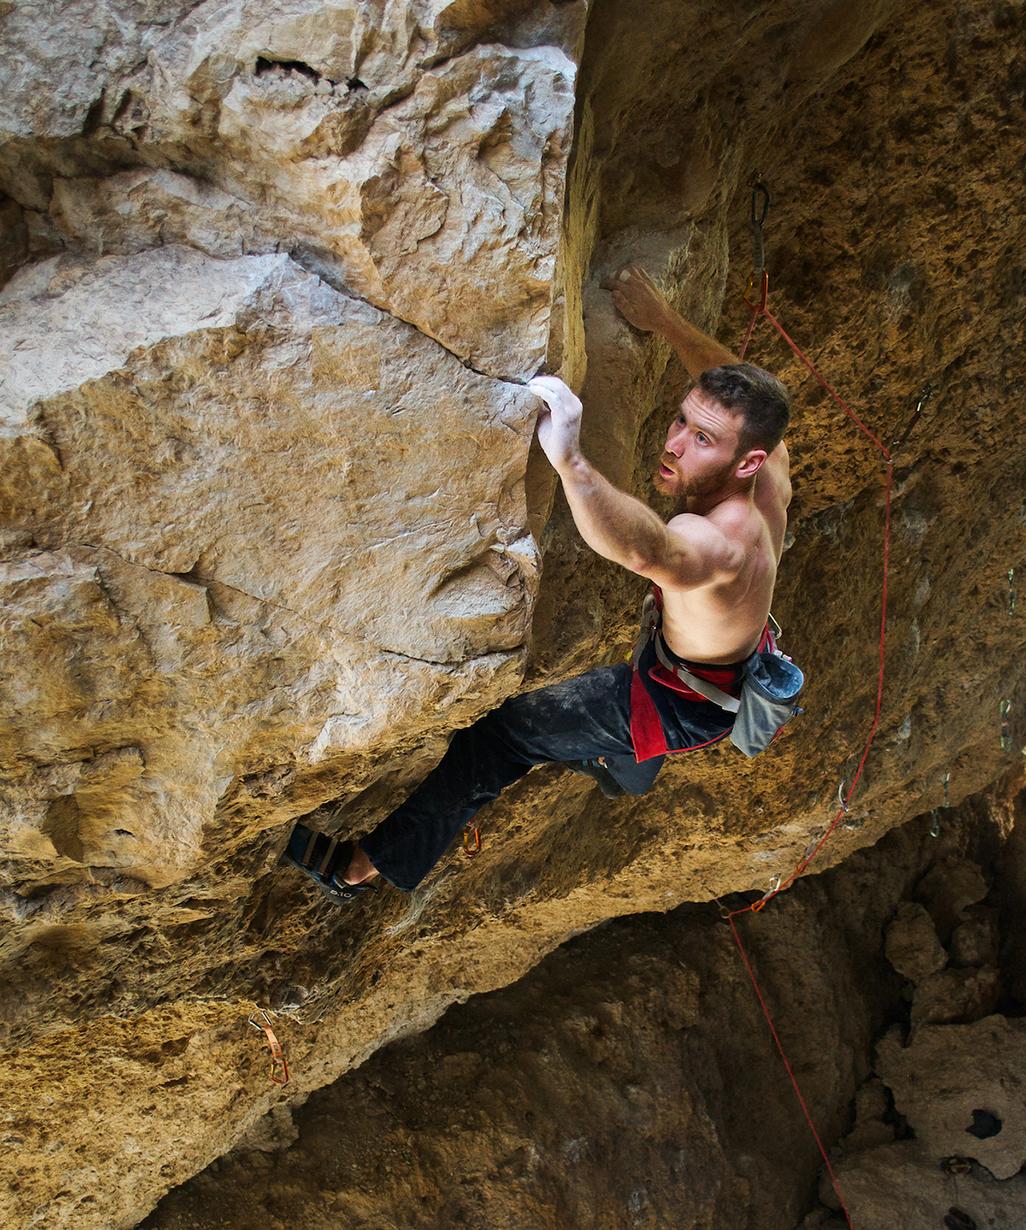 Matt Pincus Of Trainingbeta Ep 16 Blister Gear Review